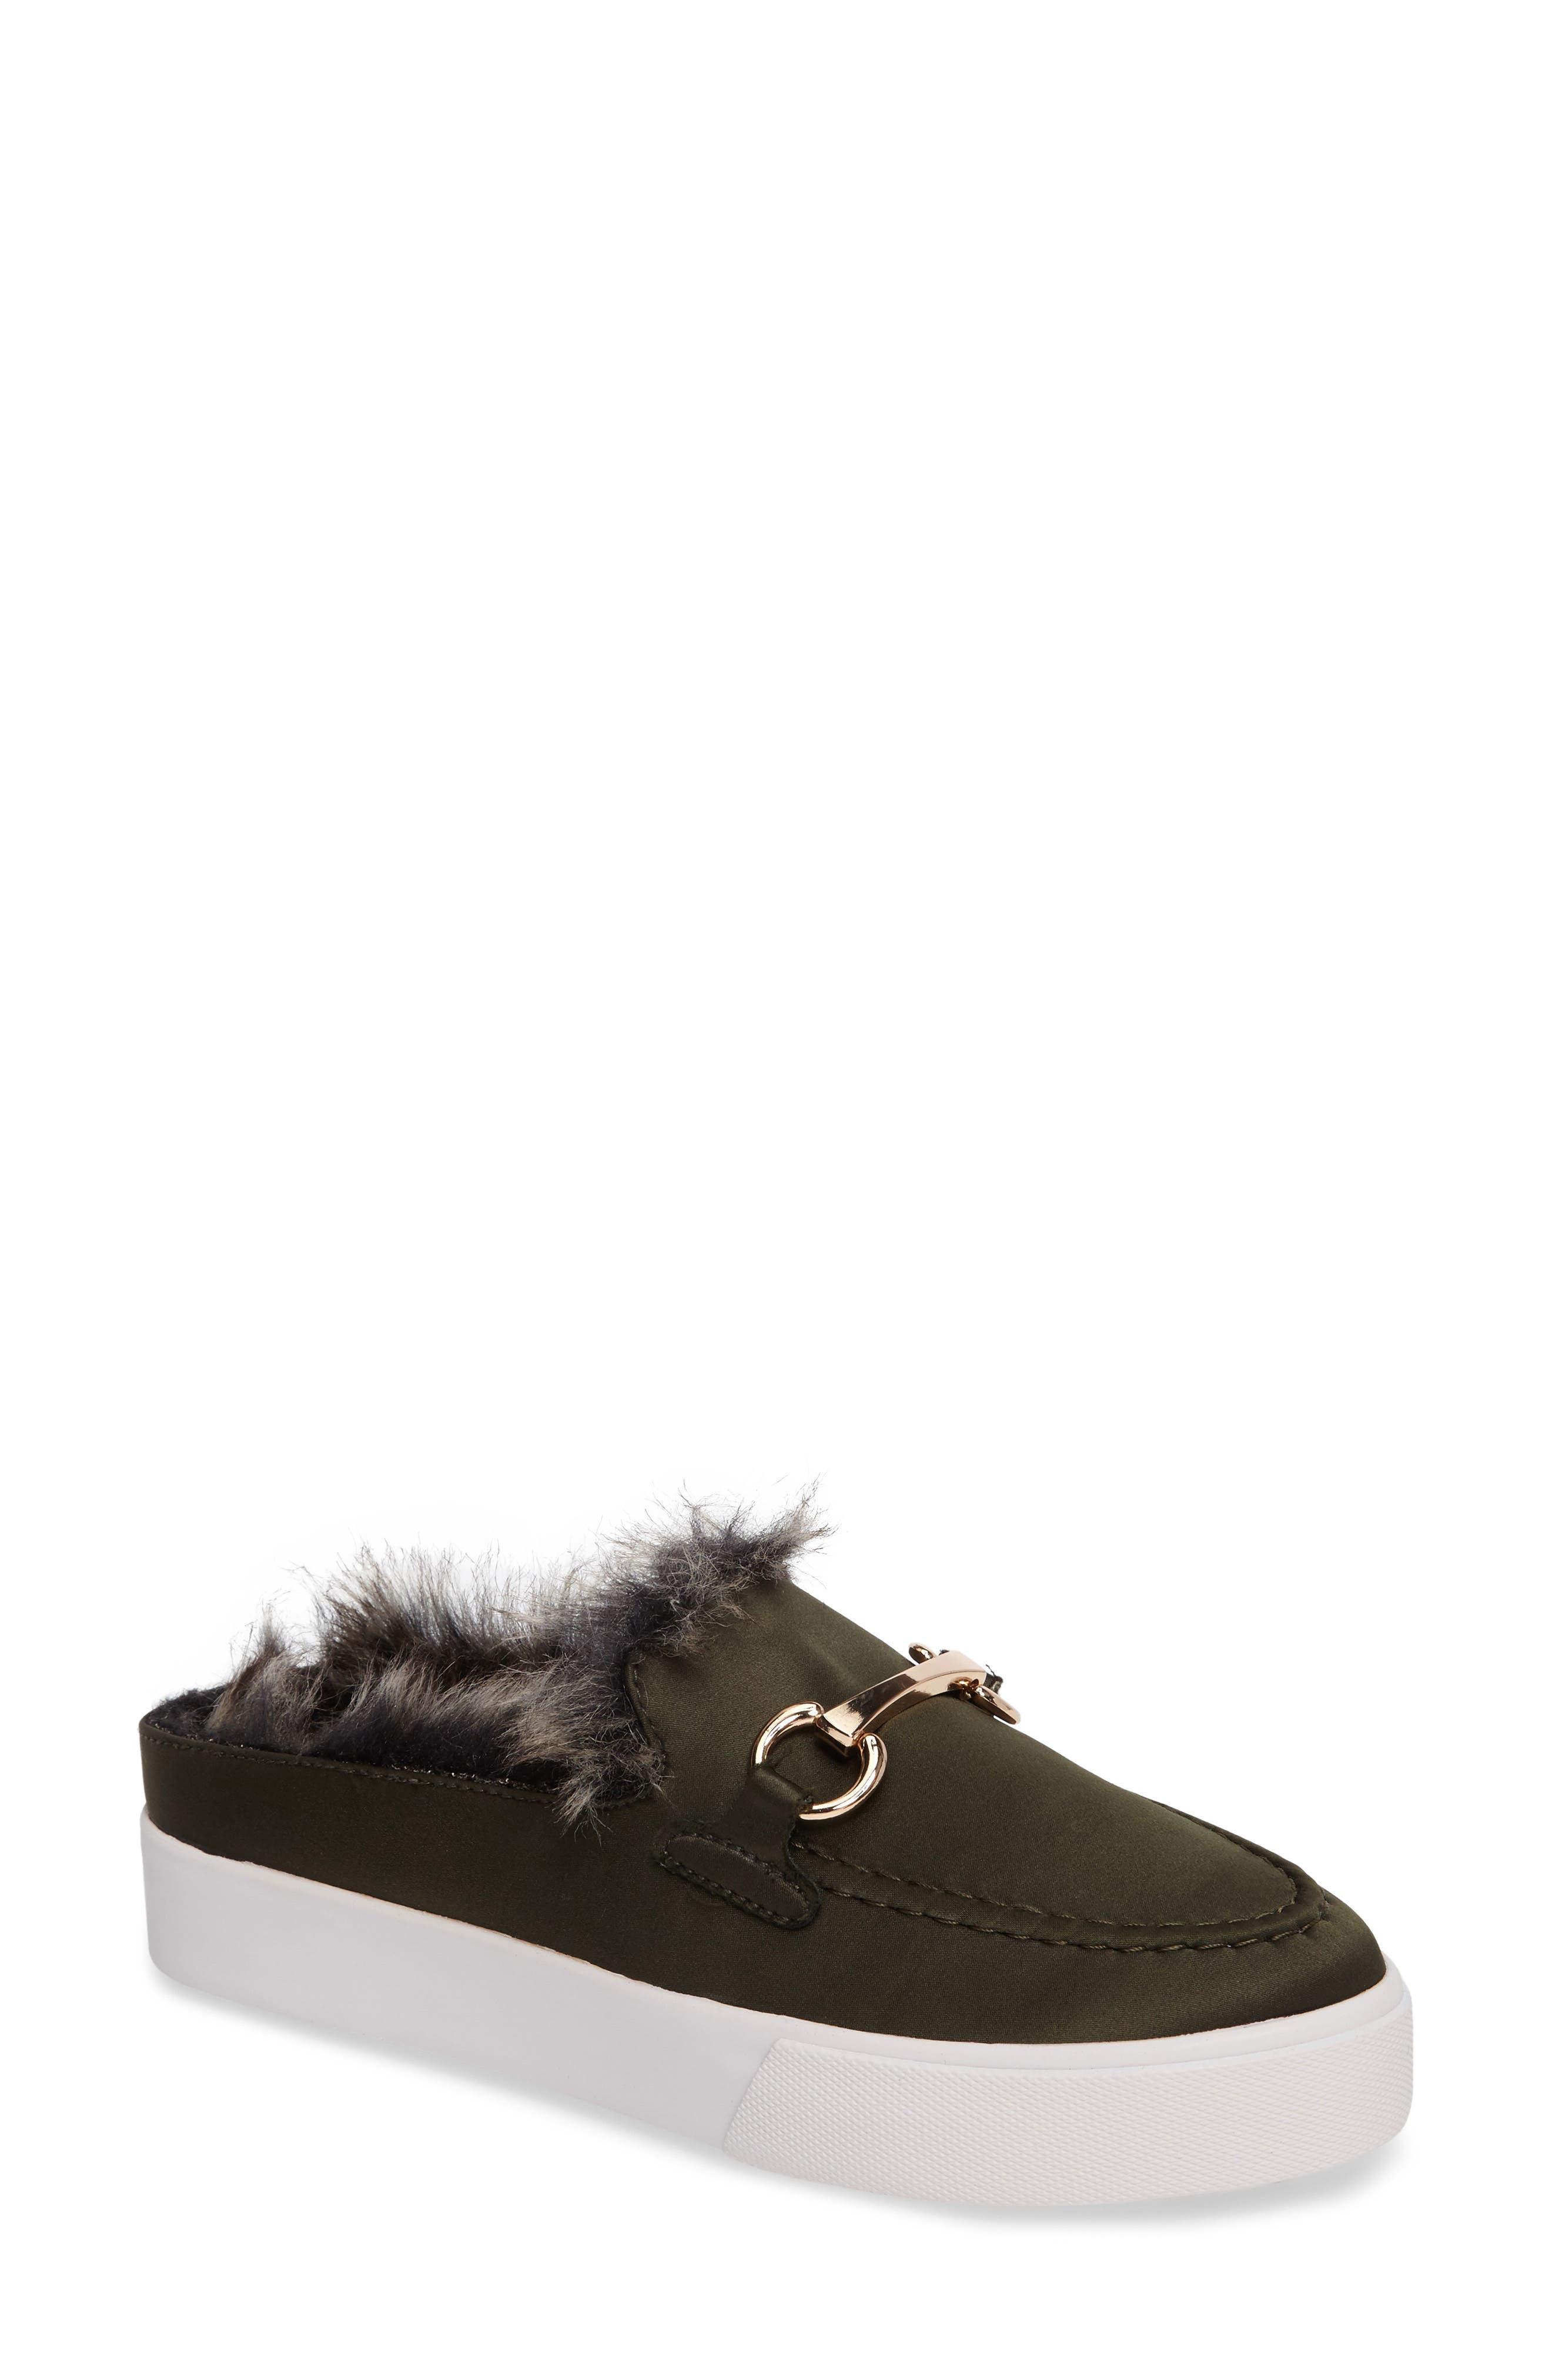 Tico Faux Fur Sneaker Mule,                         Main,                         color, Olive Satin-Gold-Grey